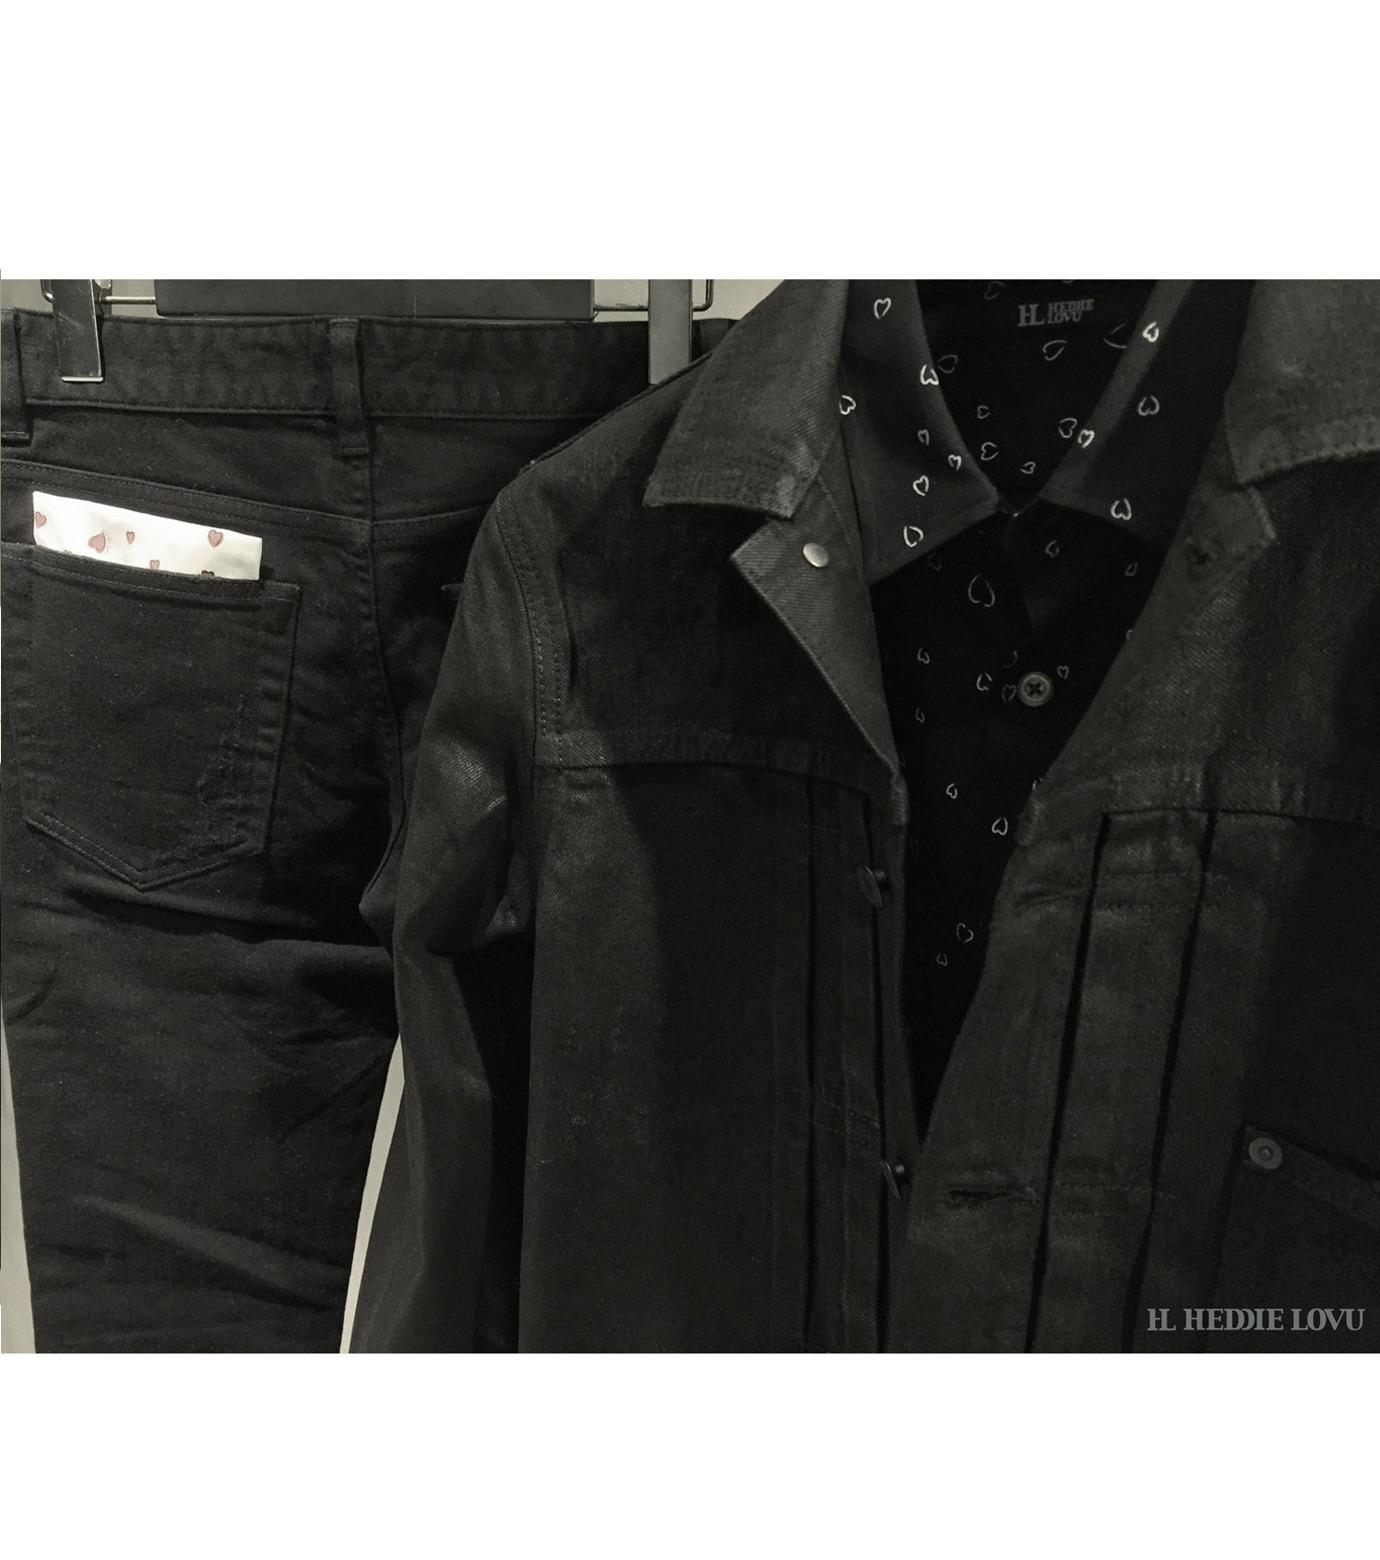 HL HEDDIE LOVU(エイチエル・エディールーヴ)のCOATING BLACK DENIM JACKET-BLACK(ジャケット/jacket)-17A94001-13 拡大詳細画像9